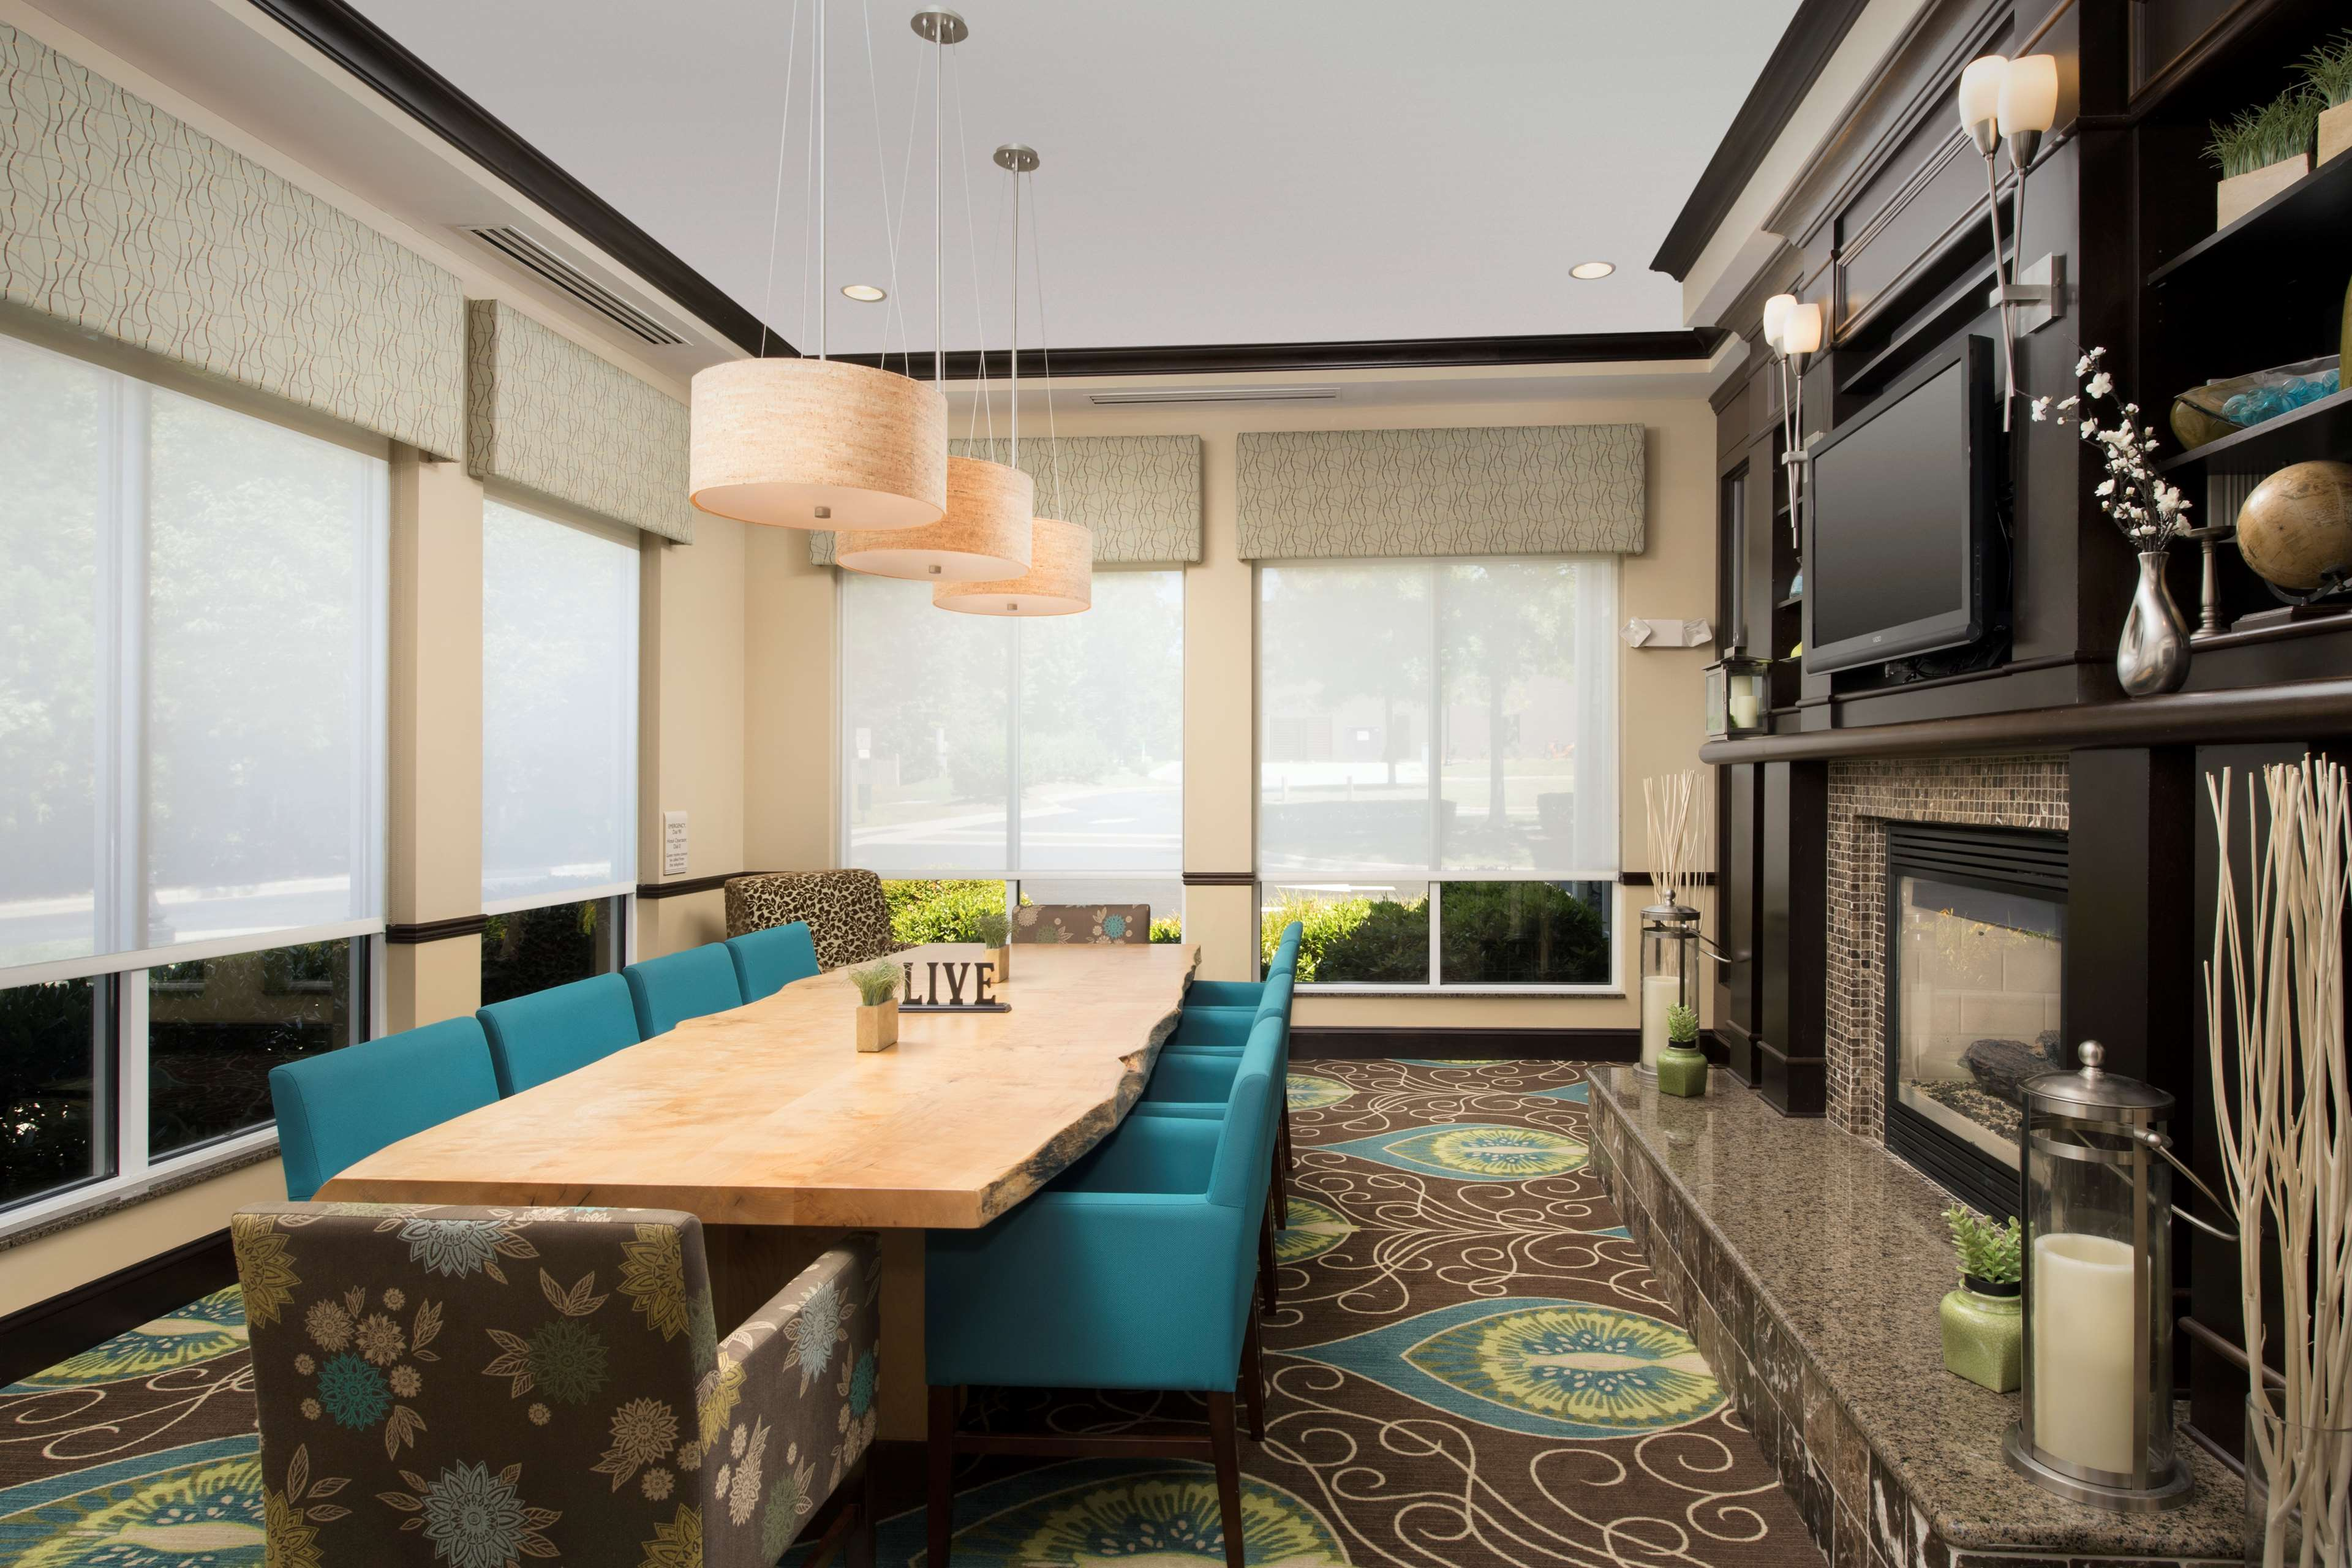 Hilton Garden Inn Winston-Salem/Hanes Mall image 2